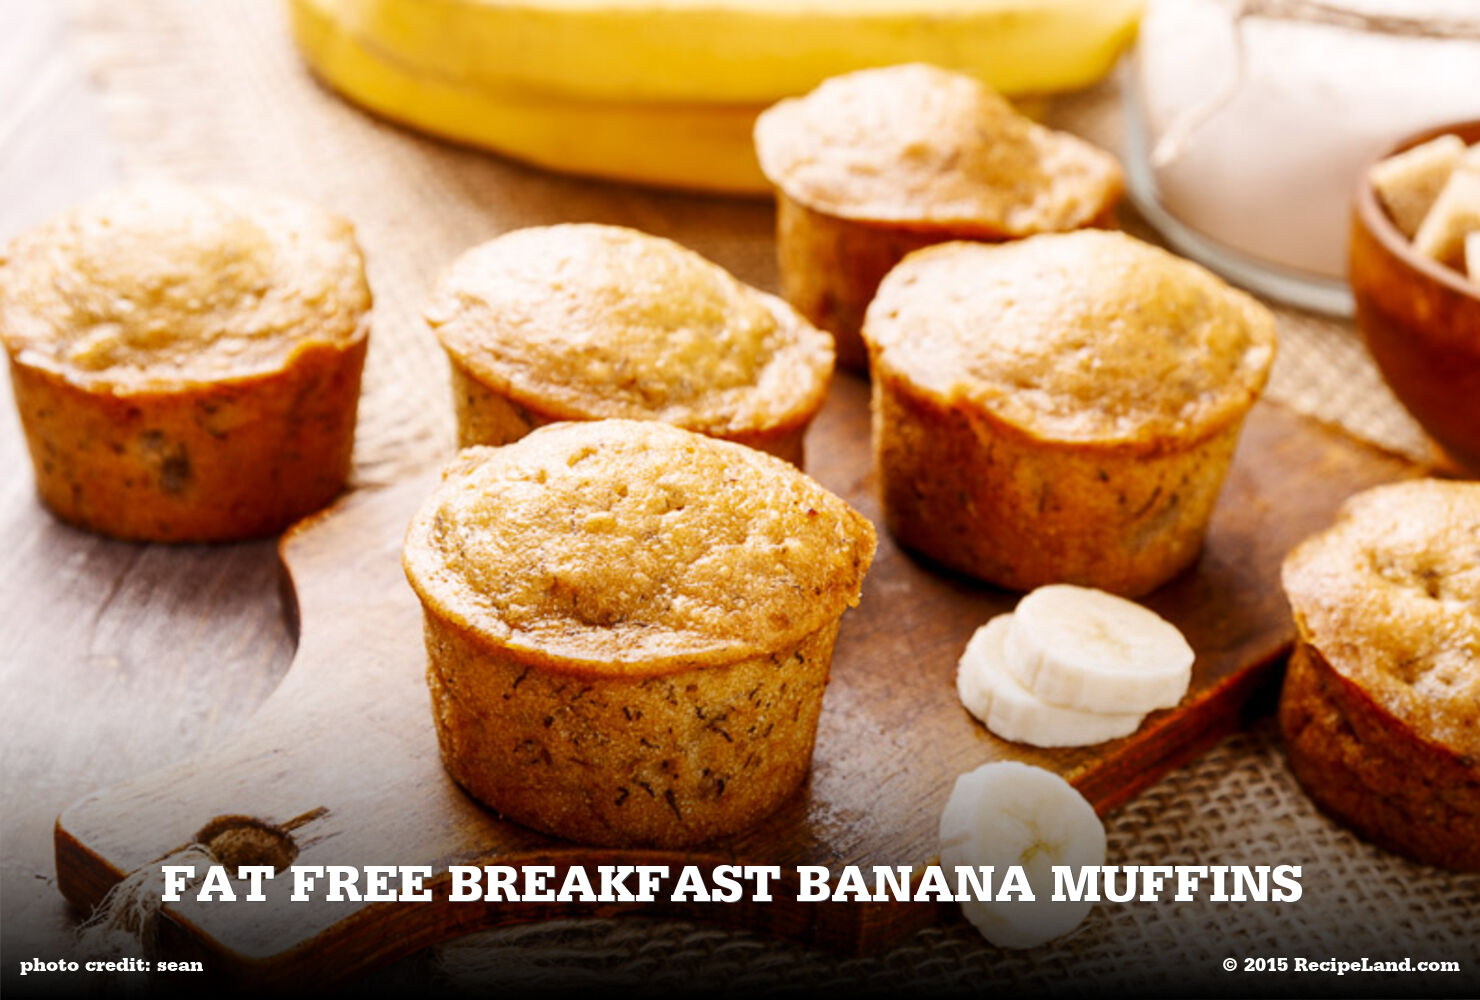 Fat Free Breakfast Banana Muffins